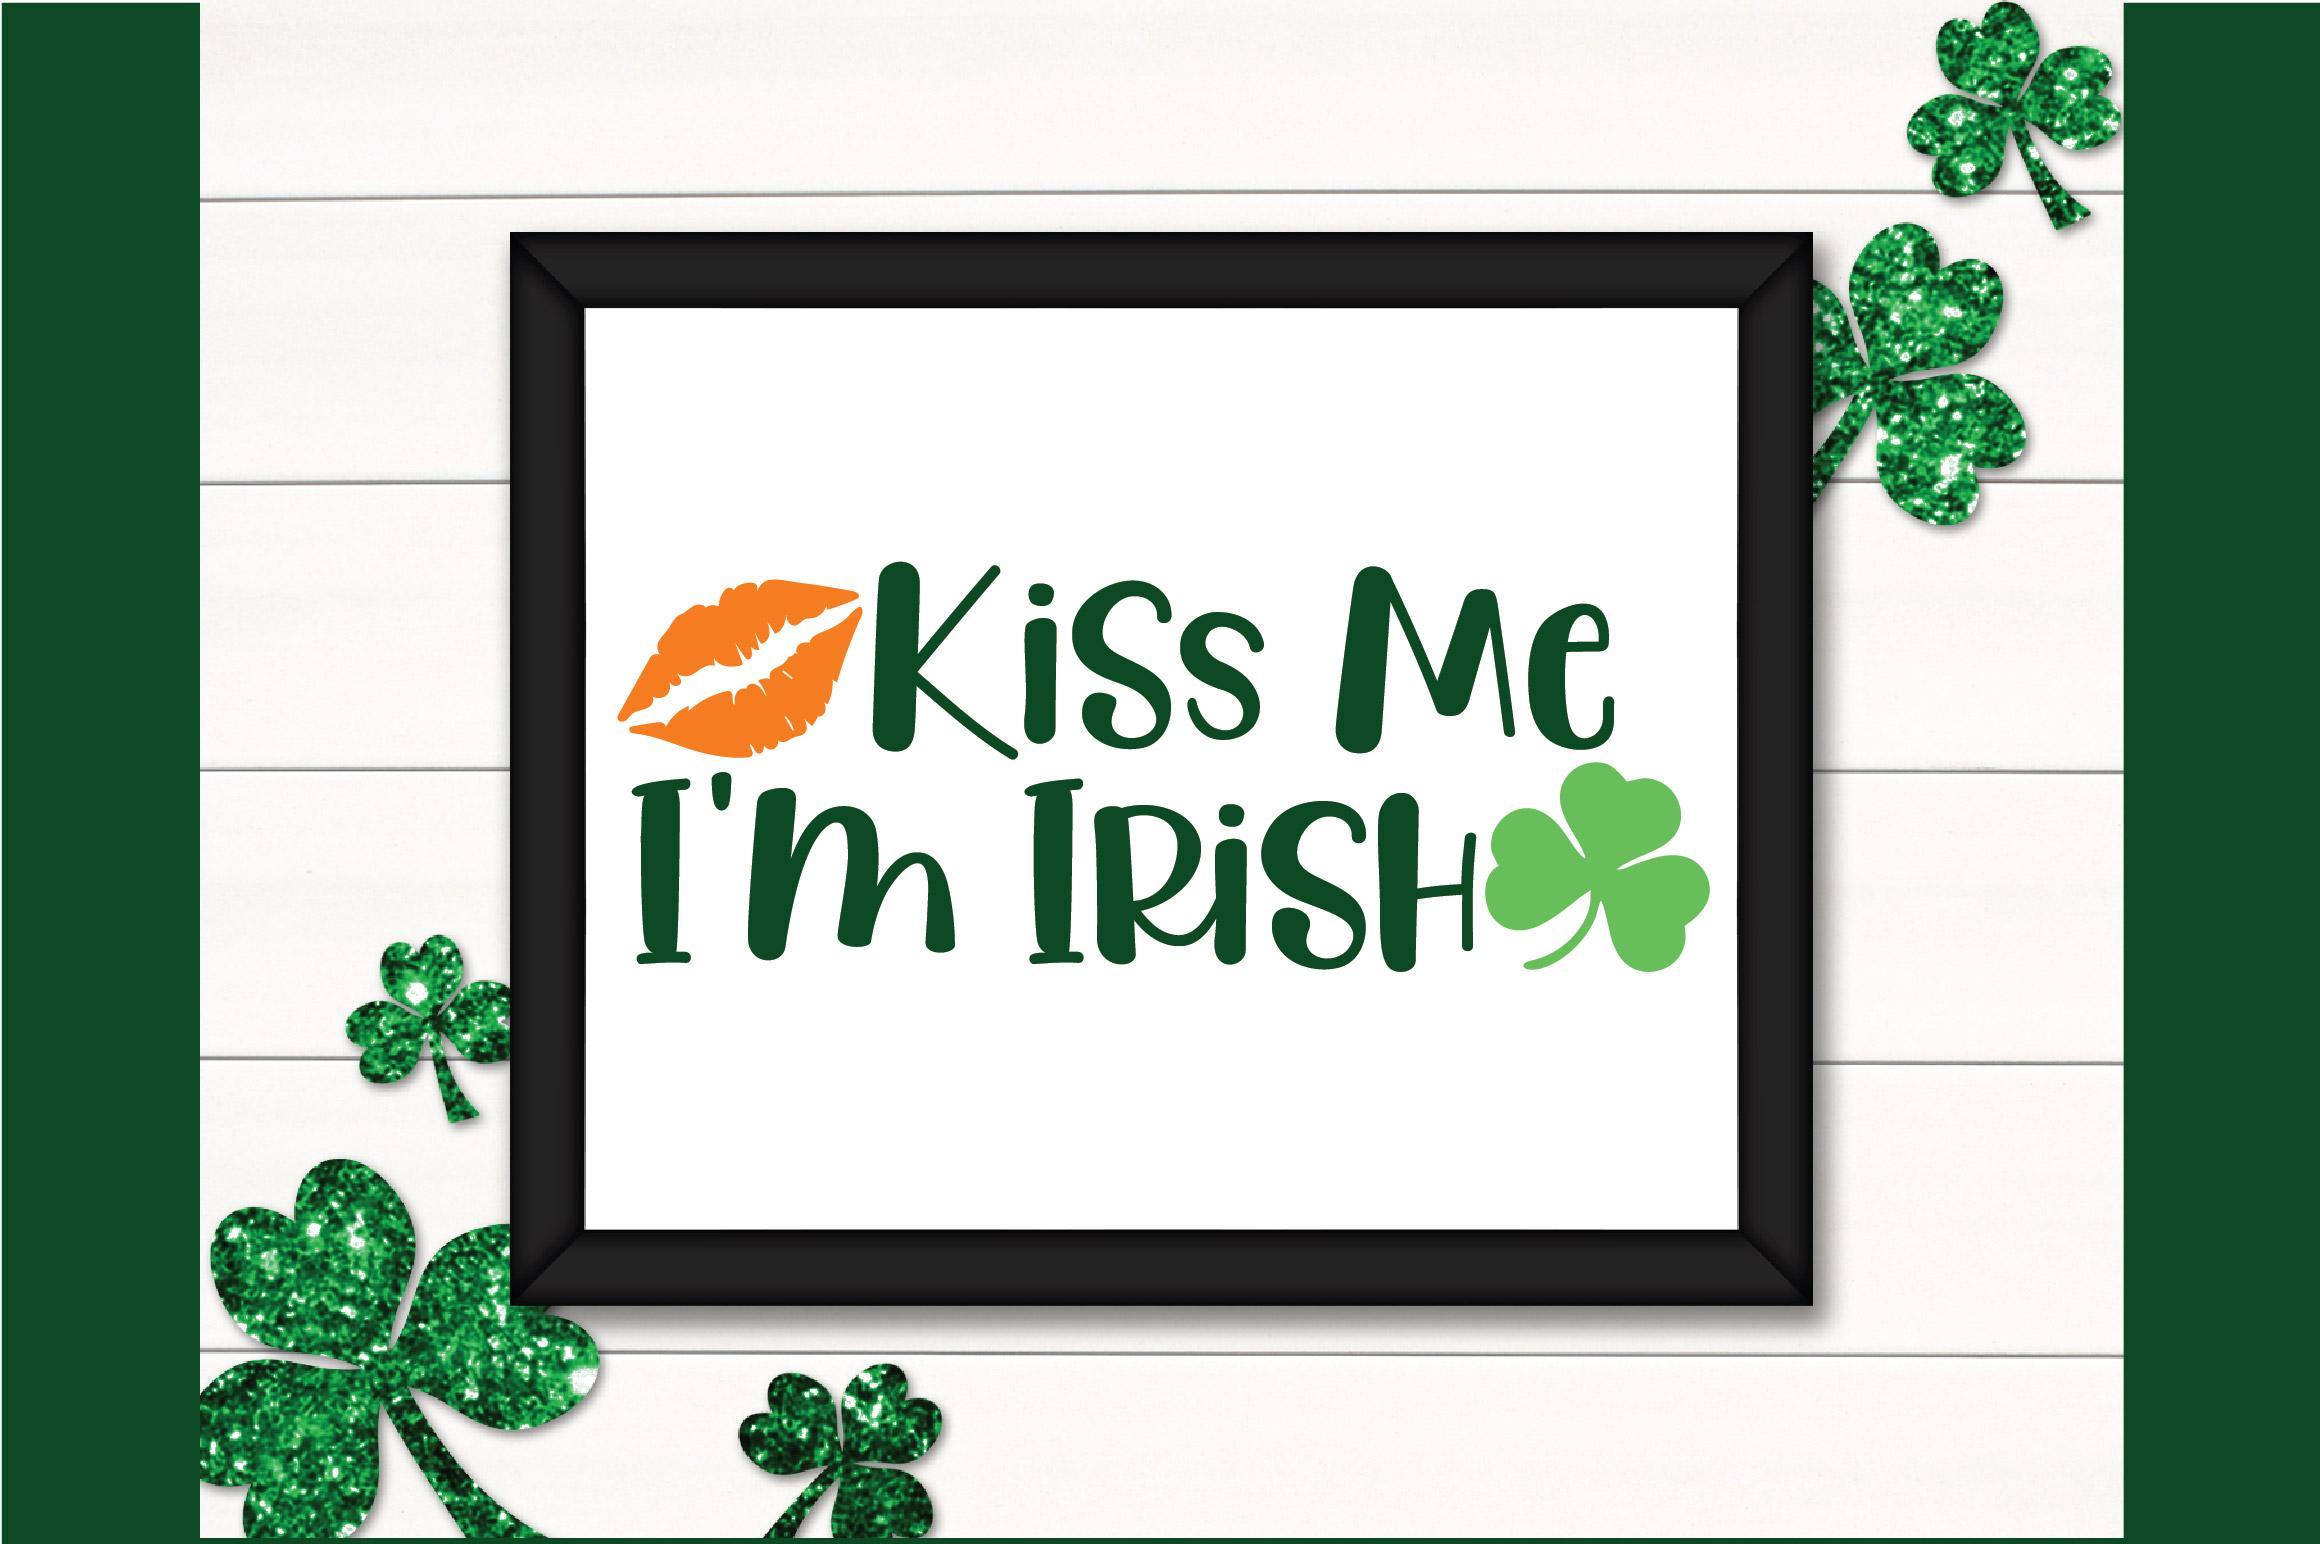 Kiss Me I'm Irish SVG Cut File - St. Patrick's Day SVG - DXF example image 4